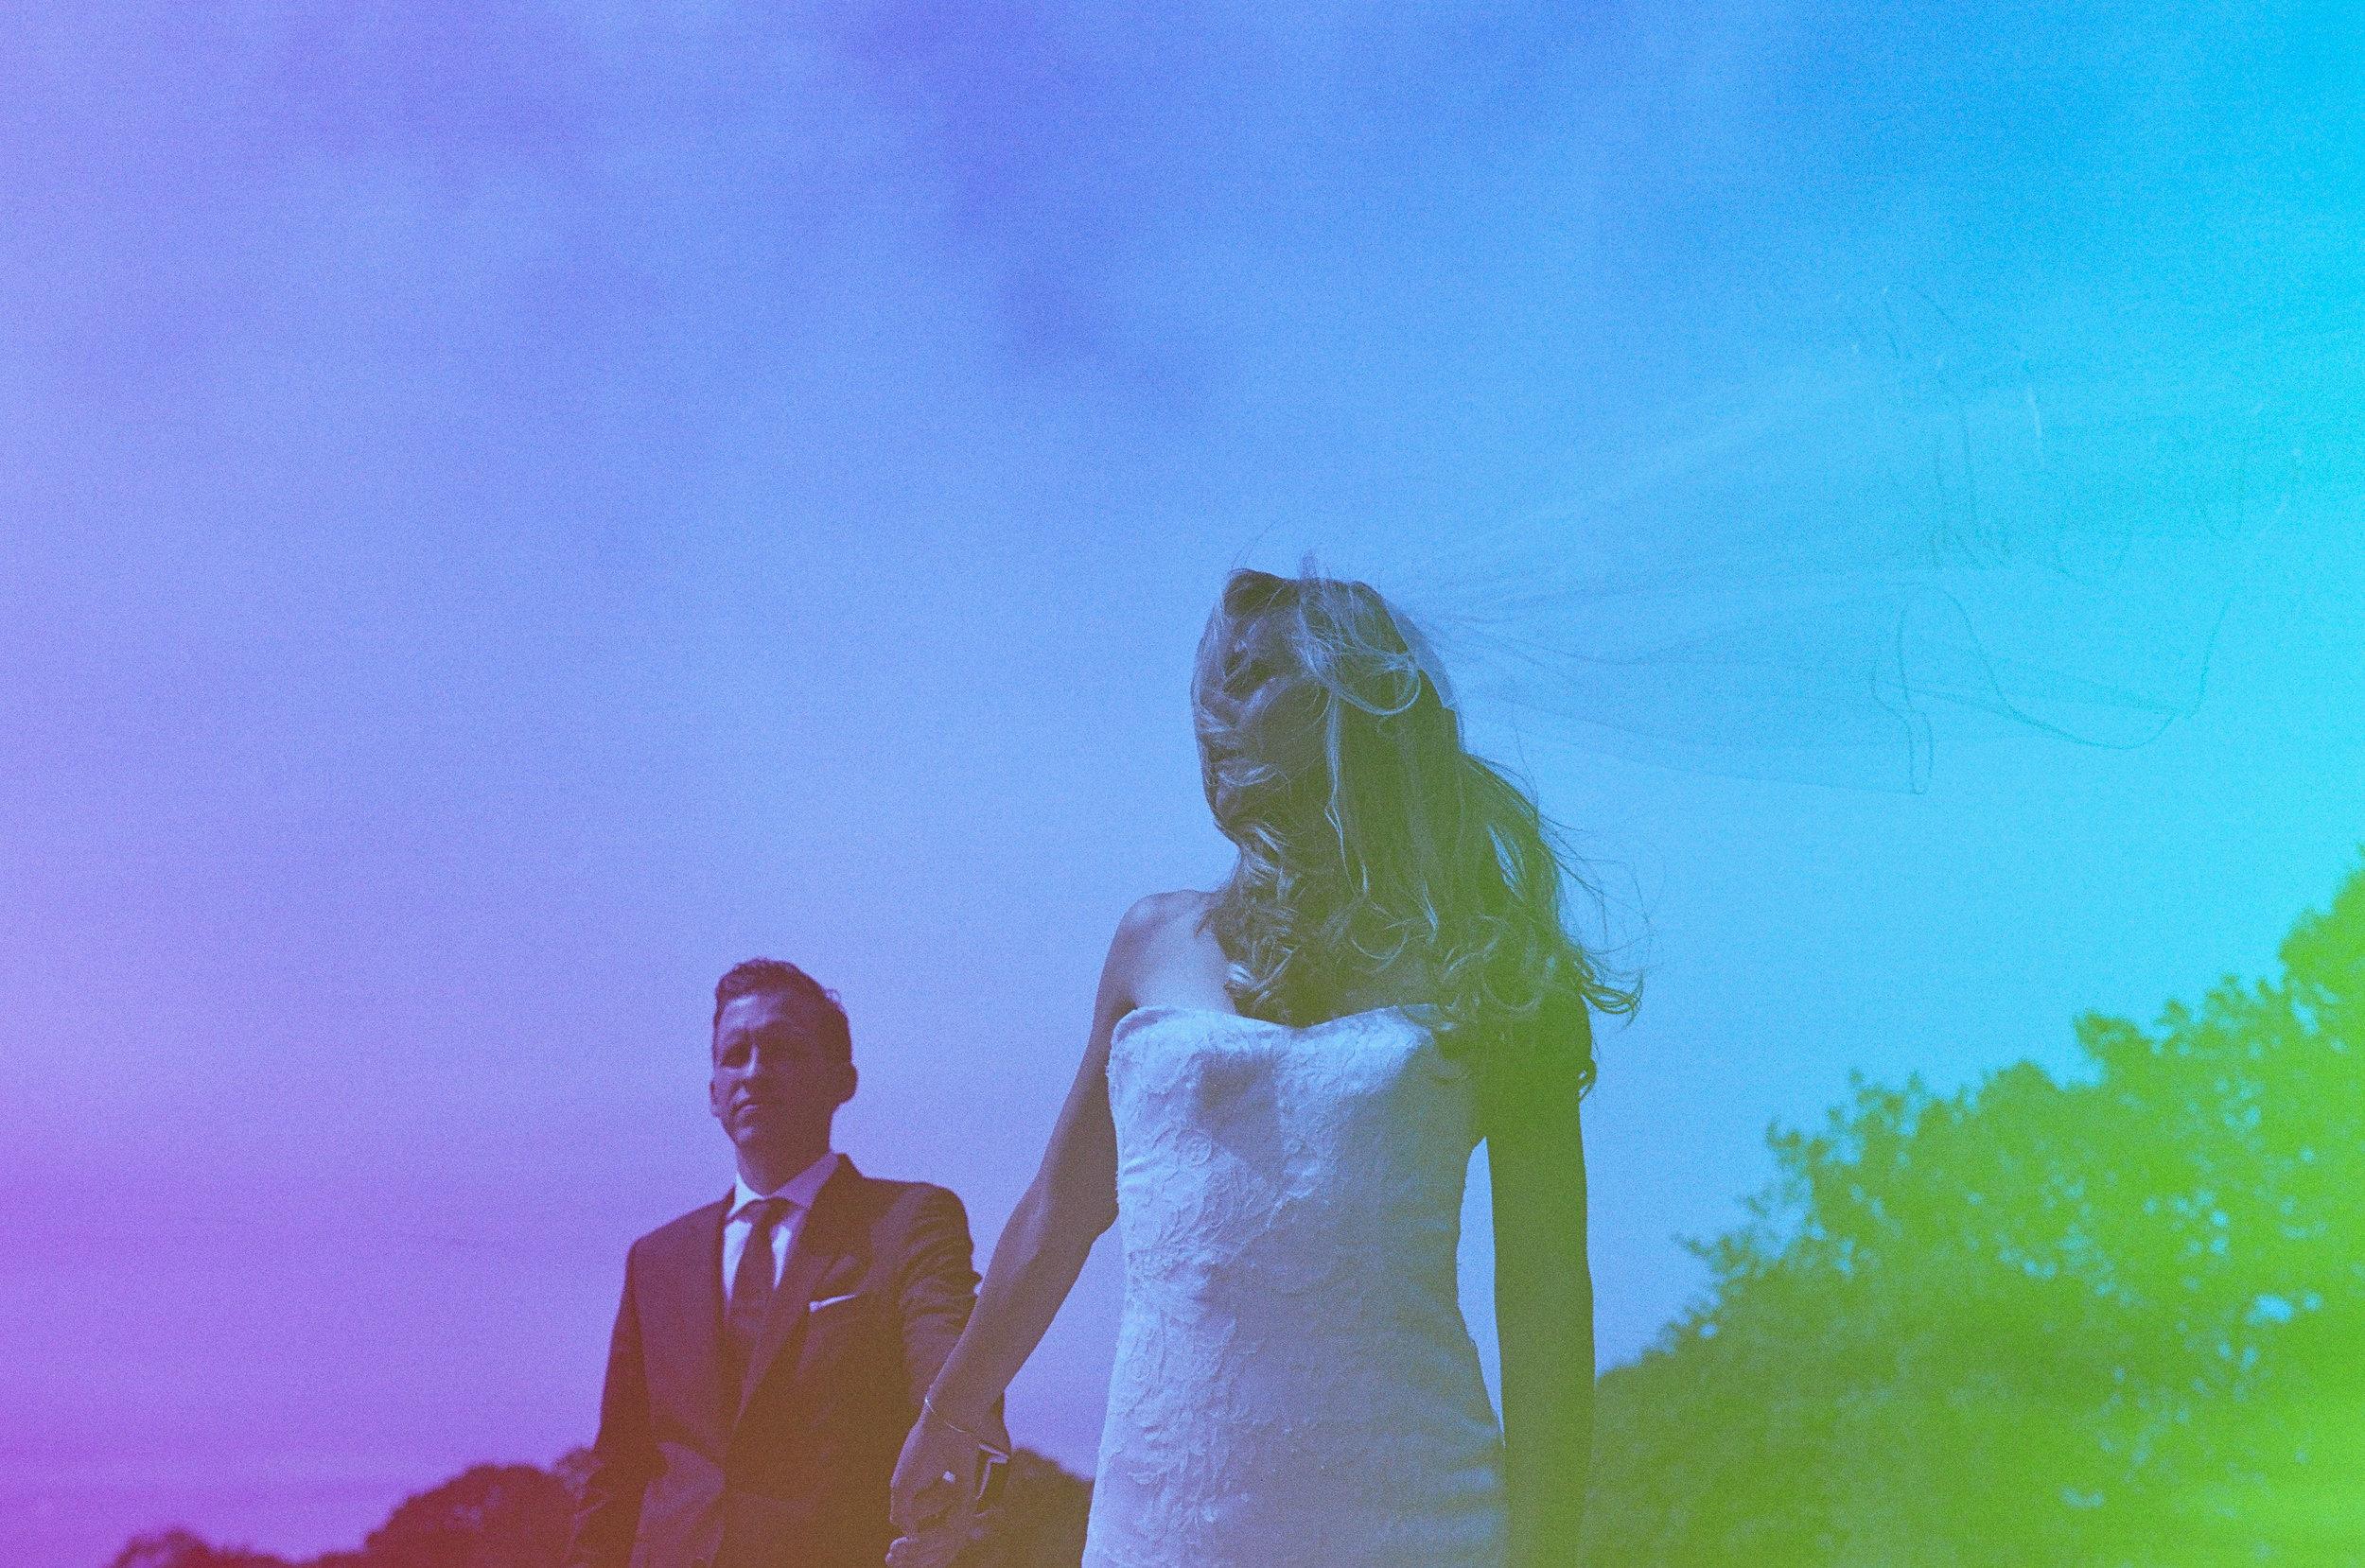 ROWAYTON_LIBRARY_WEDDING_35MM_FILM-5034.jpg